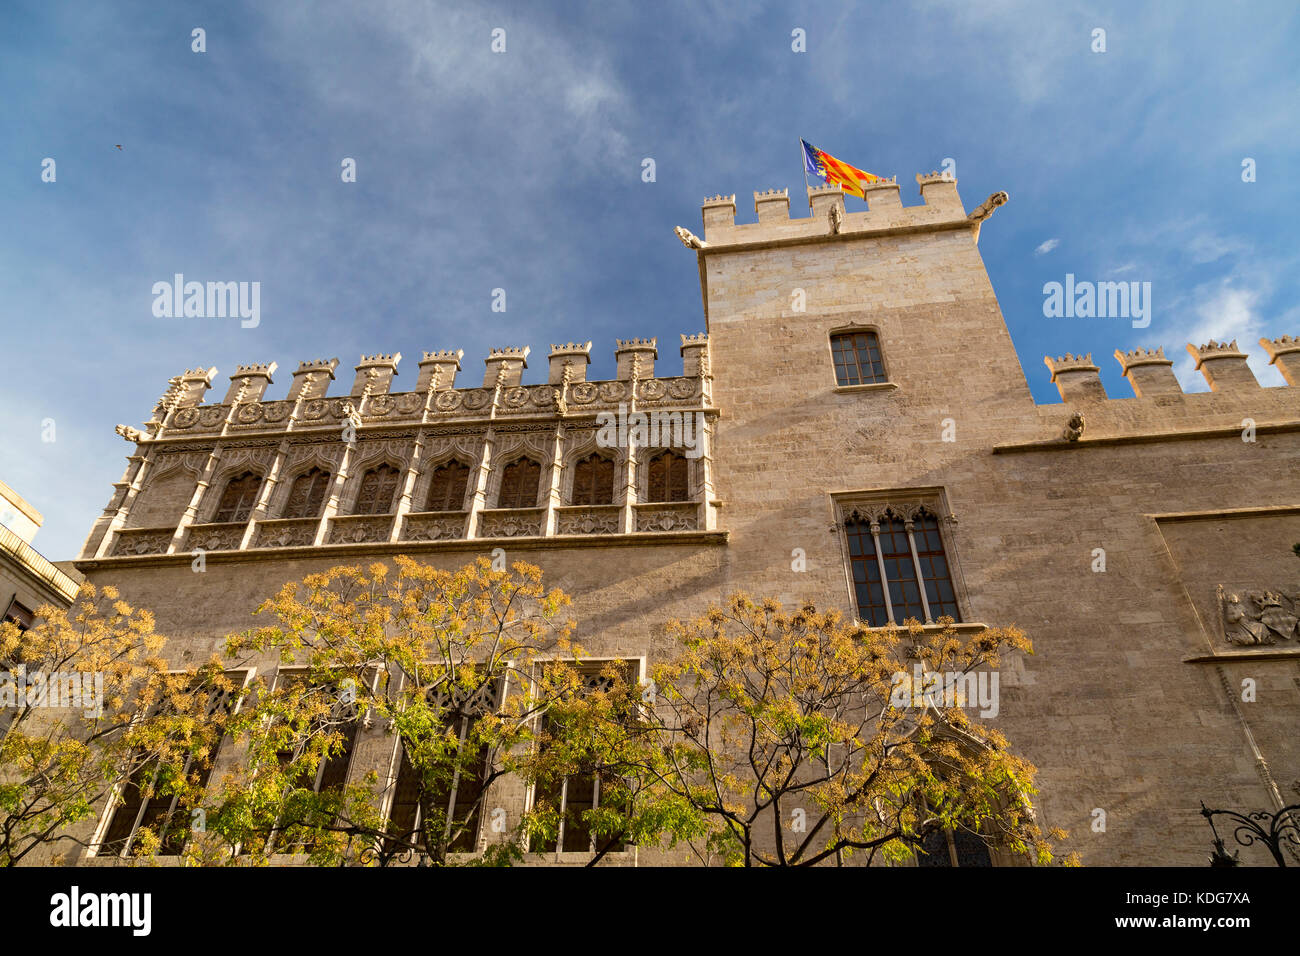 Exterior of Lonja de la Seda a 15th Century cloth market in Valencia, Spain. Stock Photo